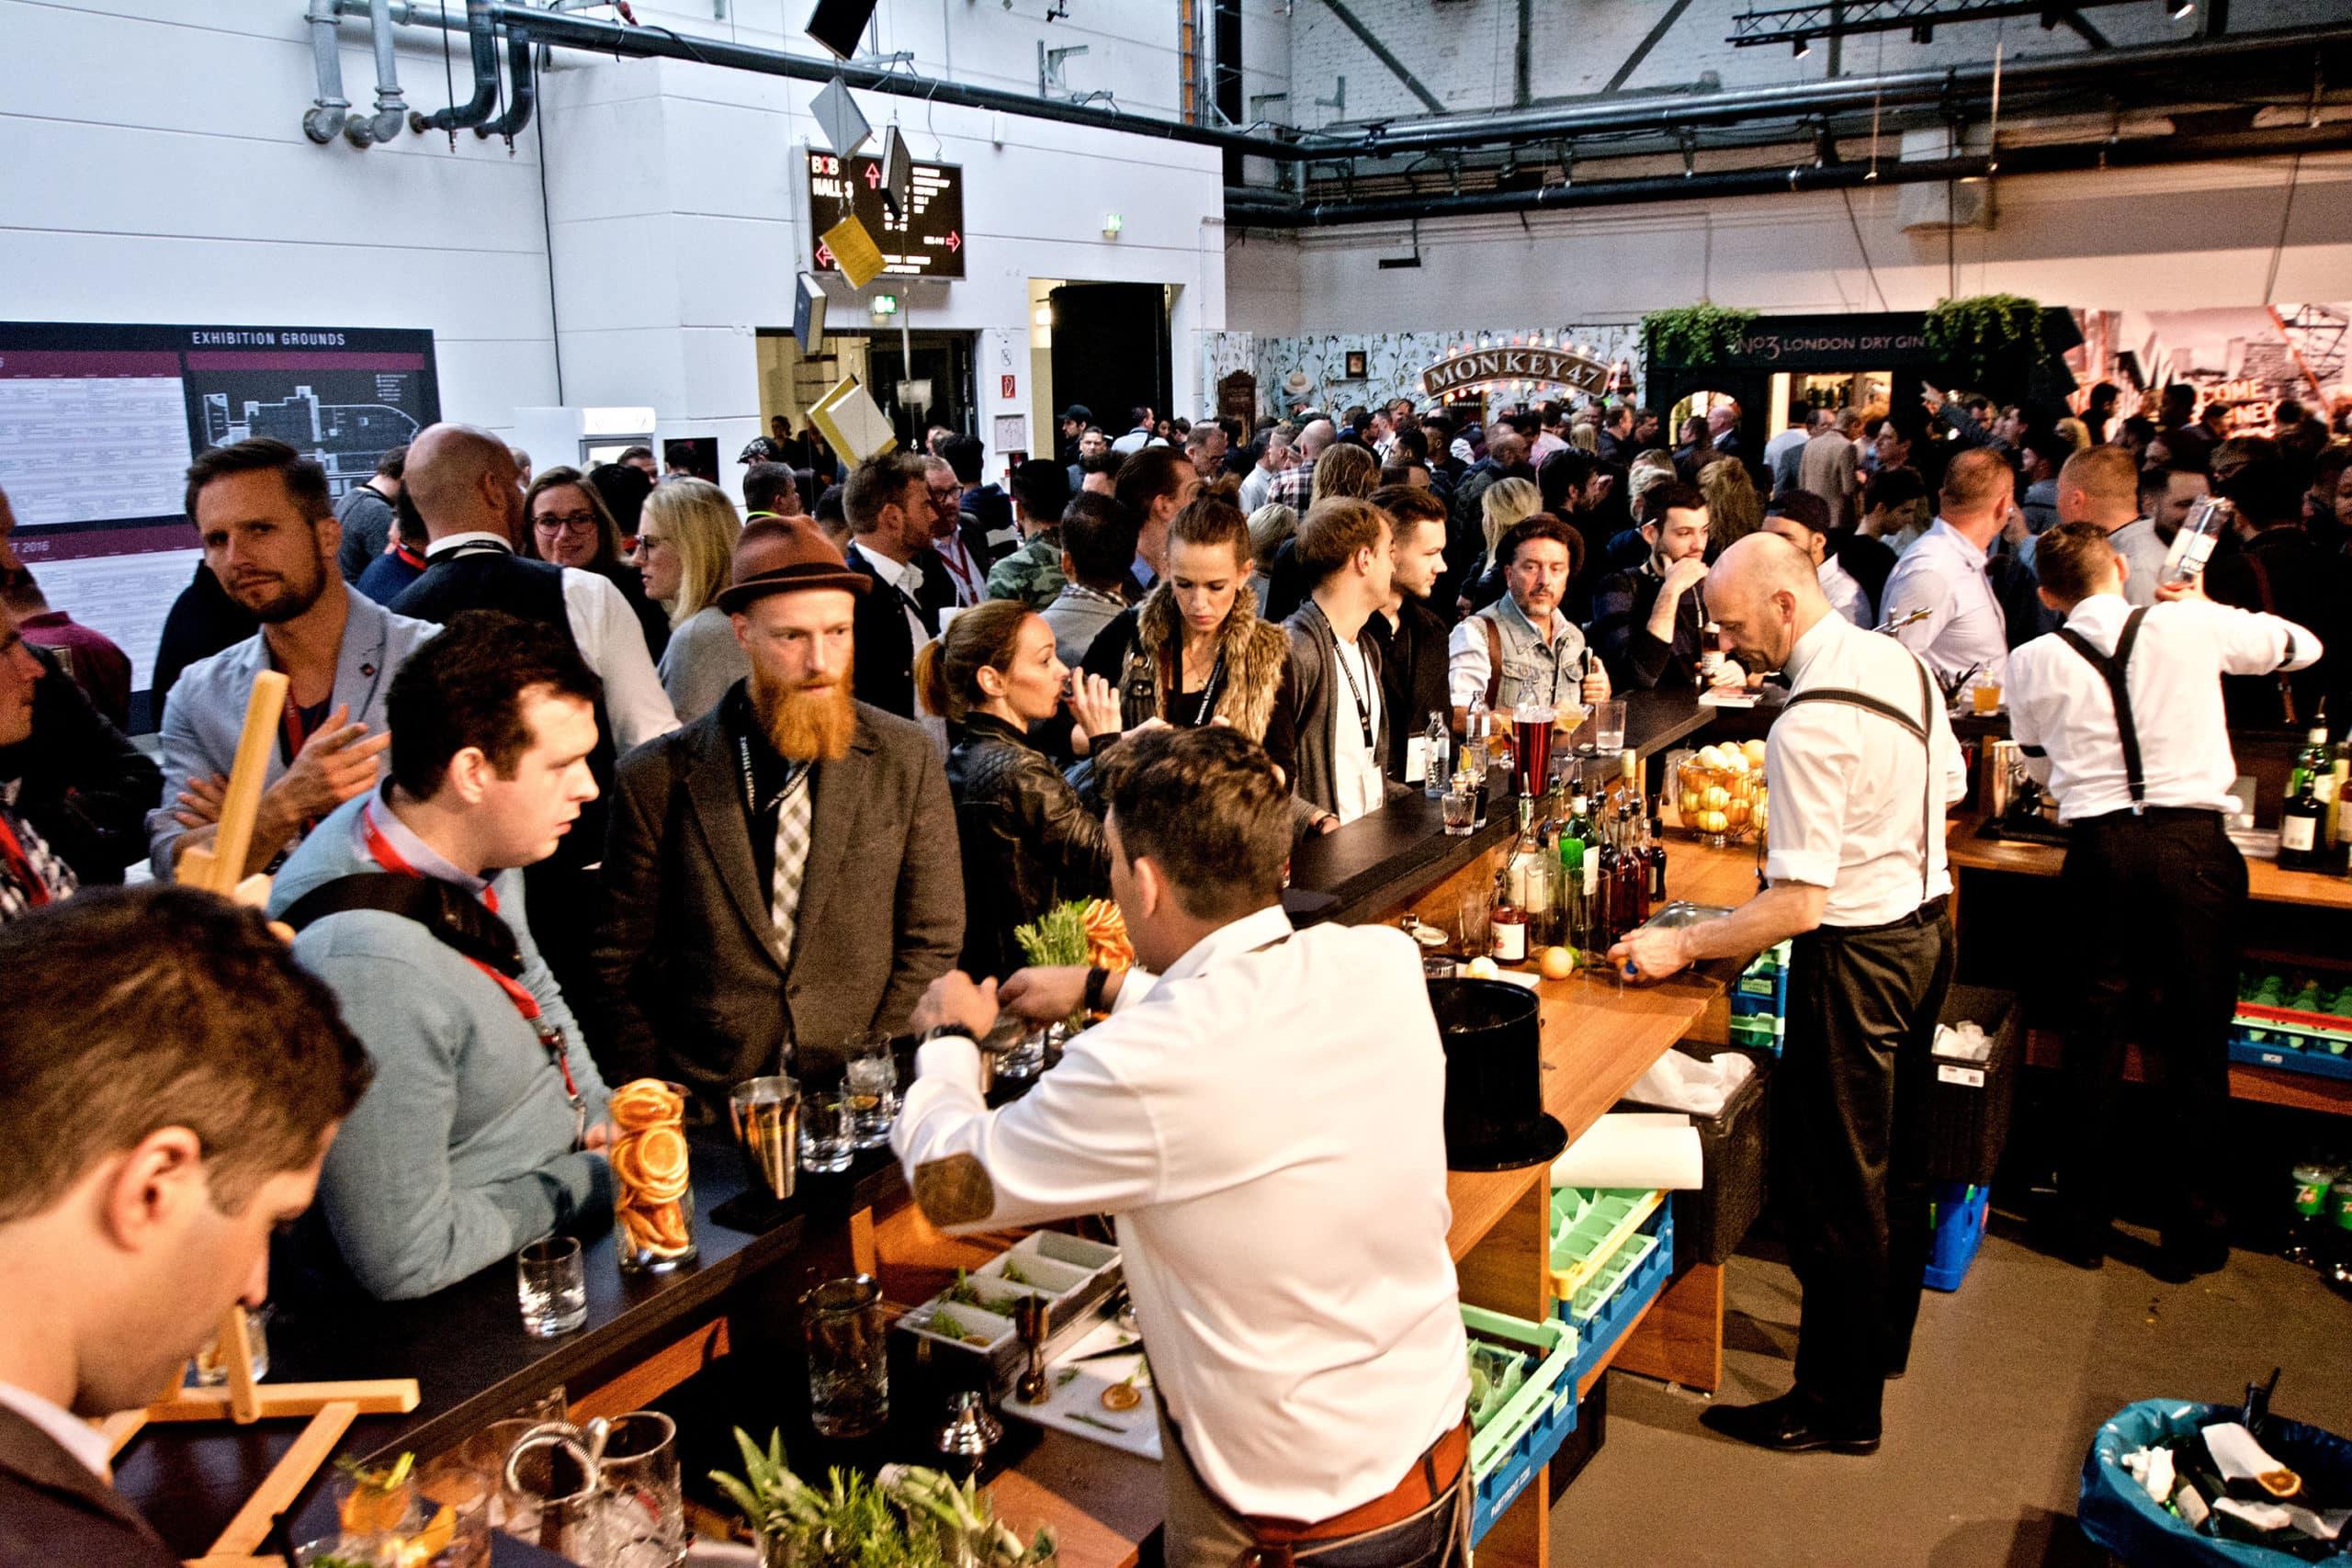 10 jähriges Jubiläum des Bar Convent Berlin (c) Bar Convent Berlin 2016 / Gili Shani